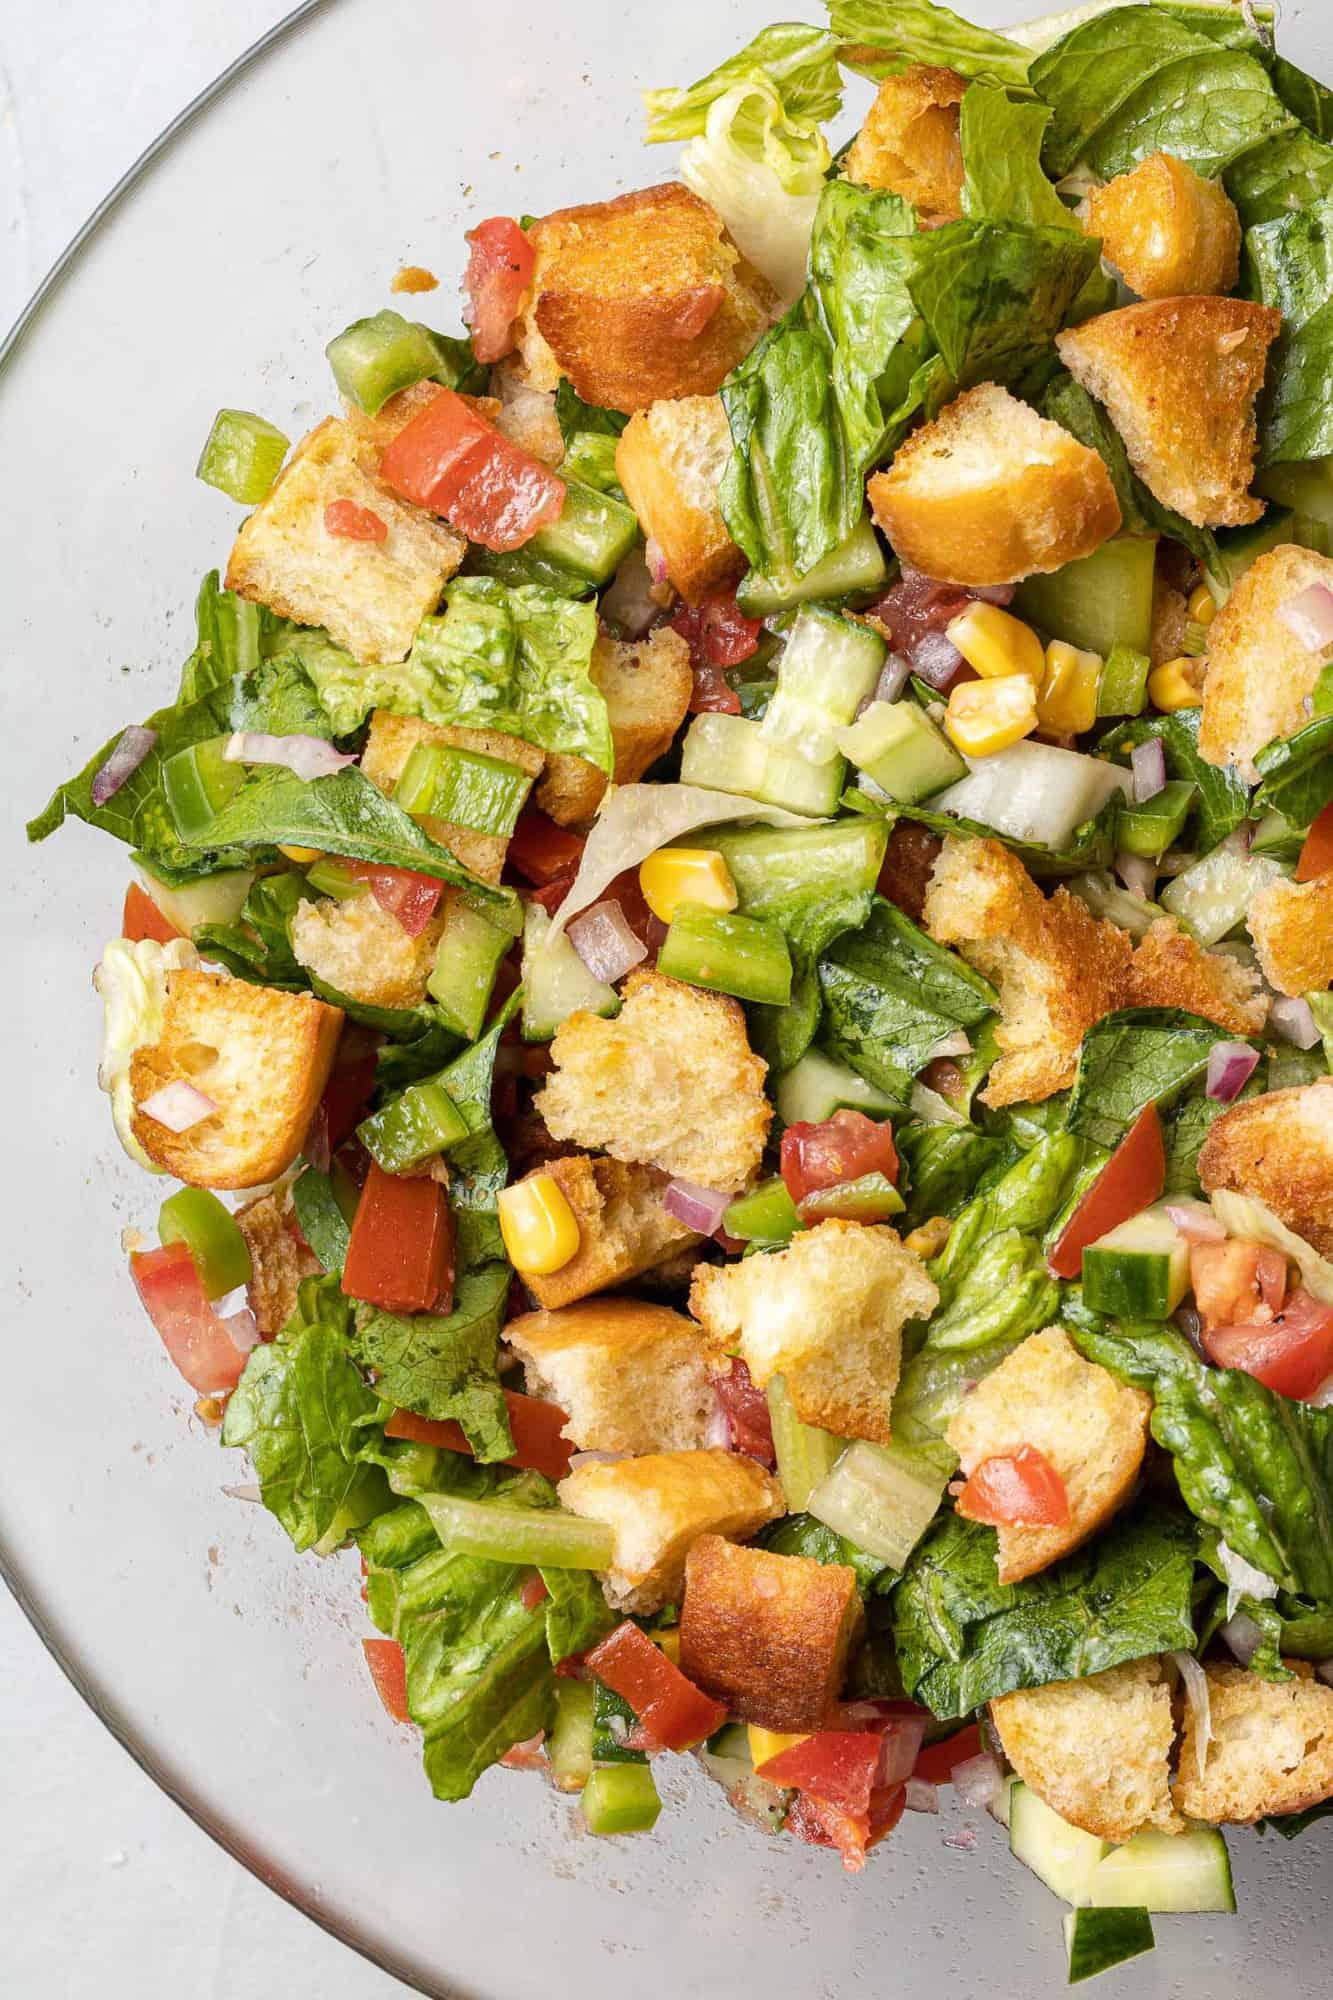 Close up gazpacho chopped salad in a clear bowl.